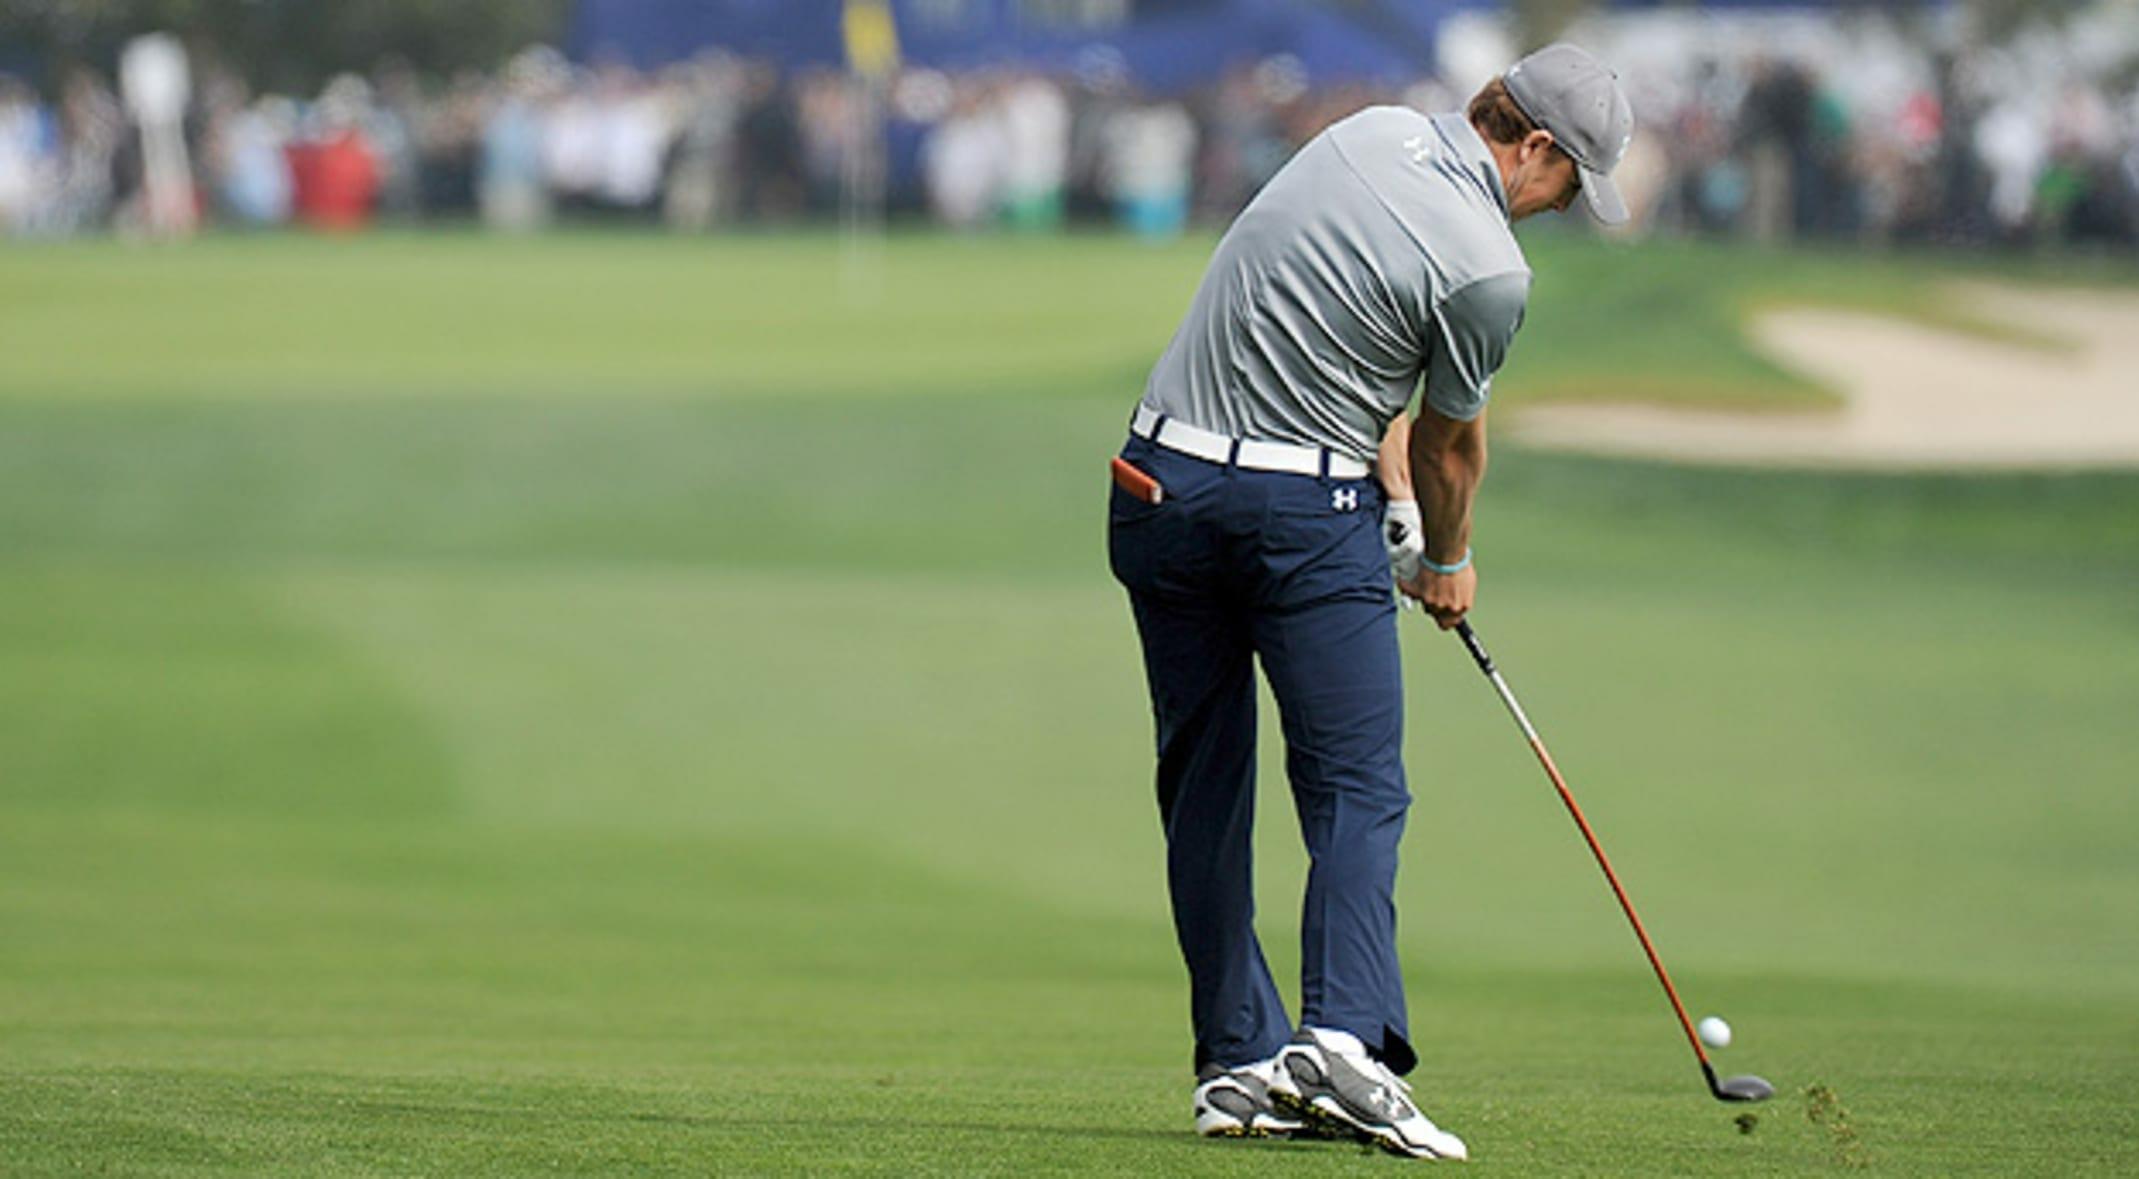 The 5 Best Hybrid Golf Clubs 2021